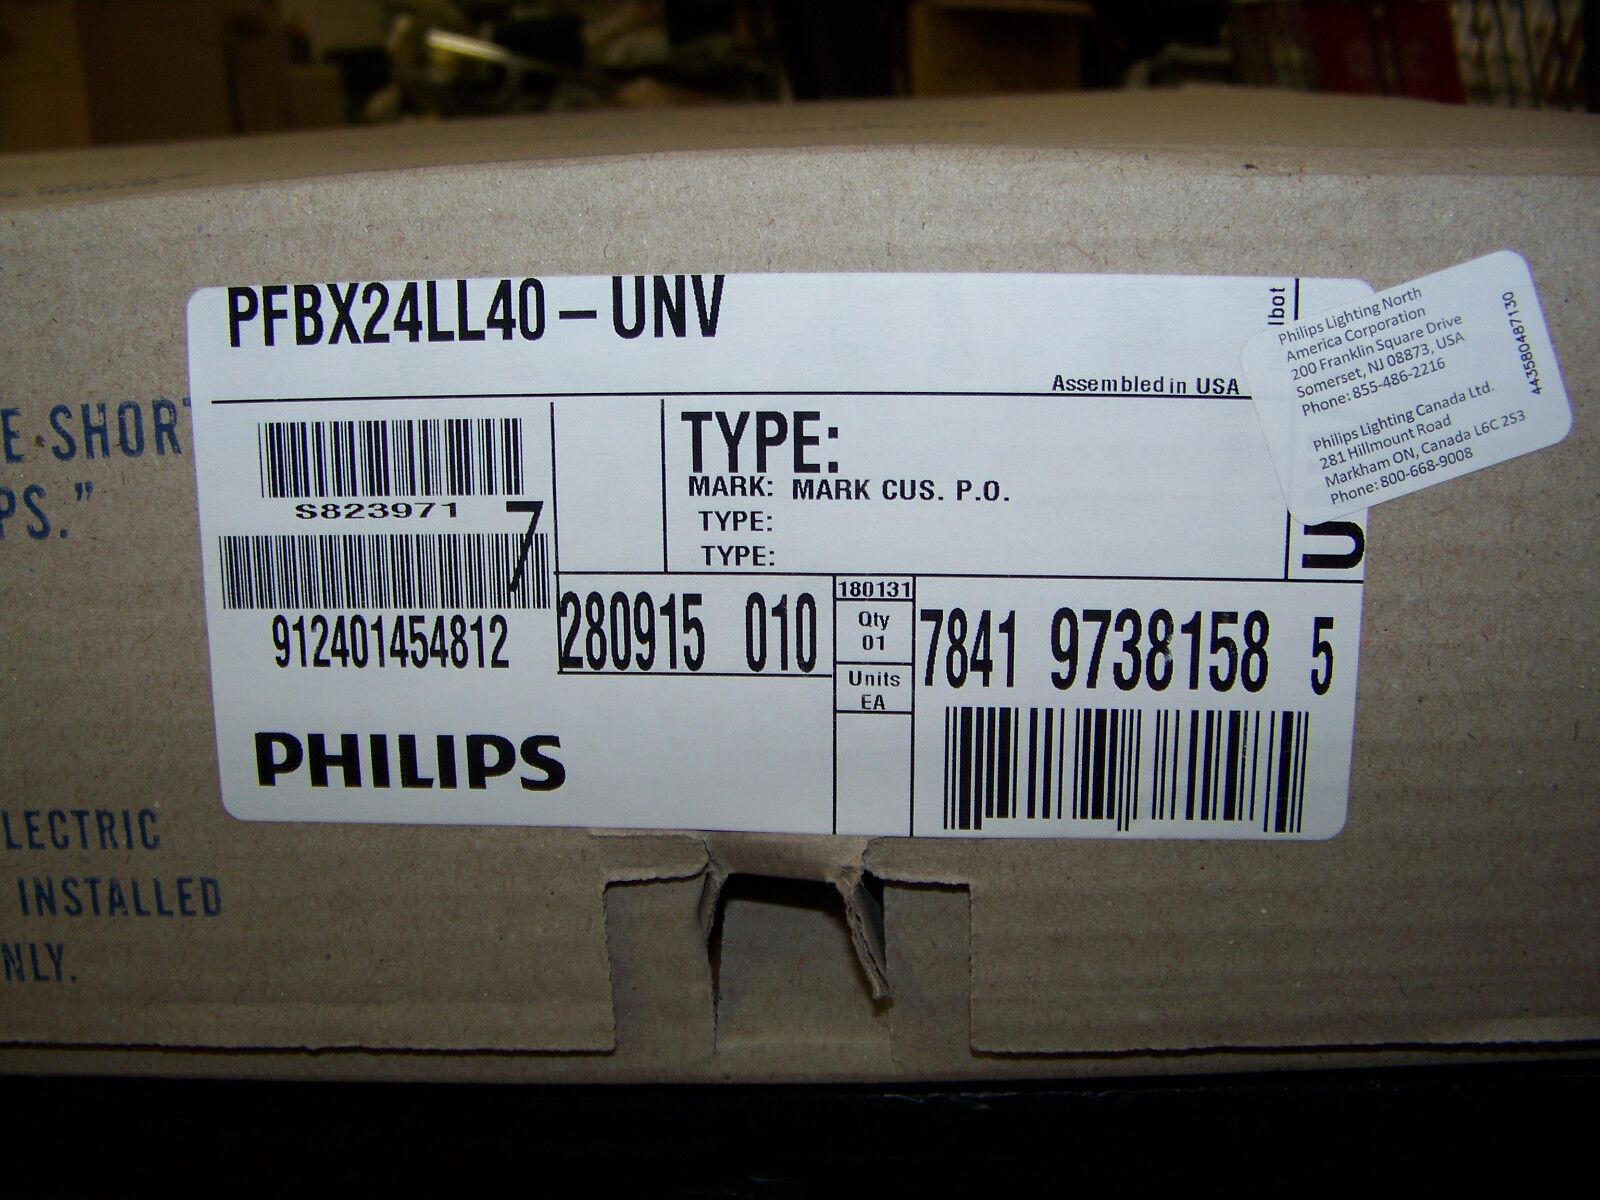 Philips FBX LED Highbay Light 120-277 VAC 191 Max Watts 50 60 Hz PFBX24LL40-UNV